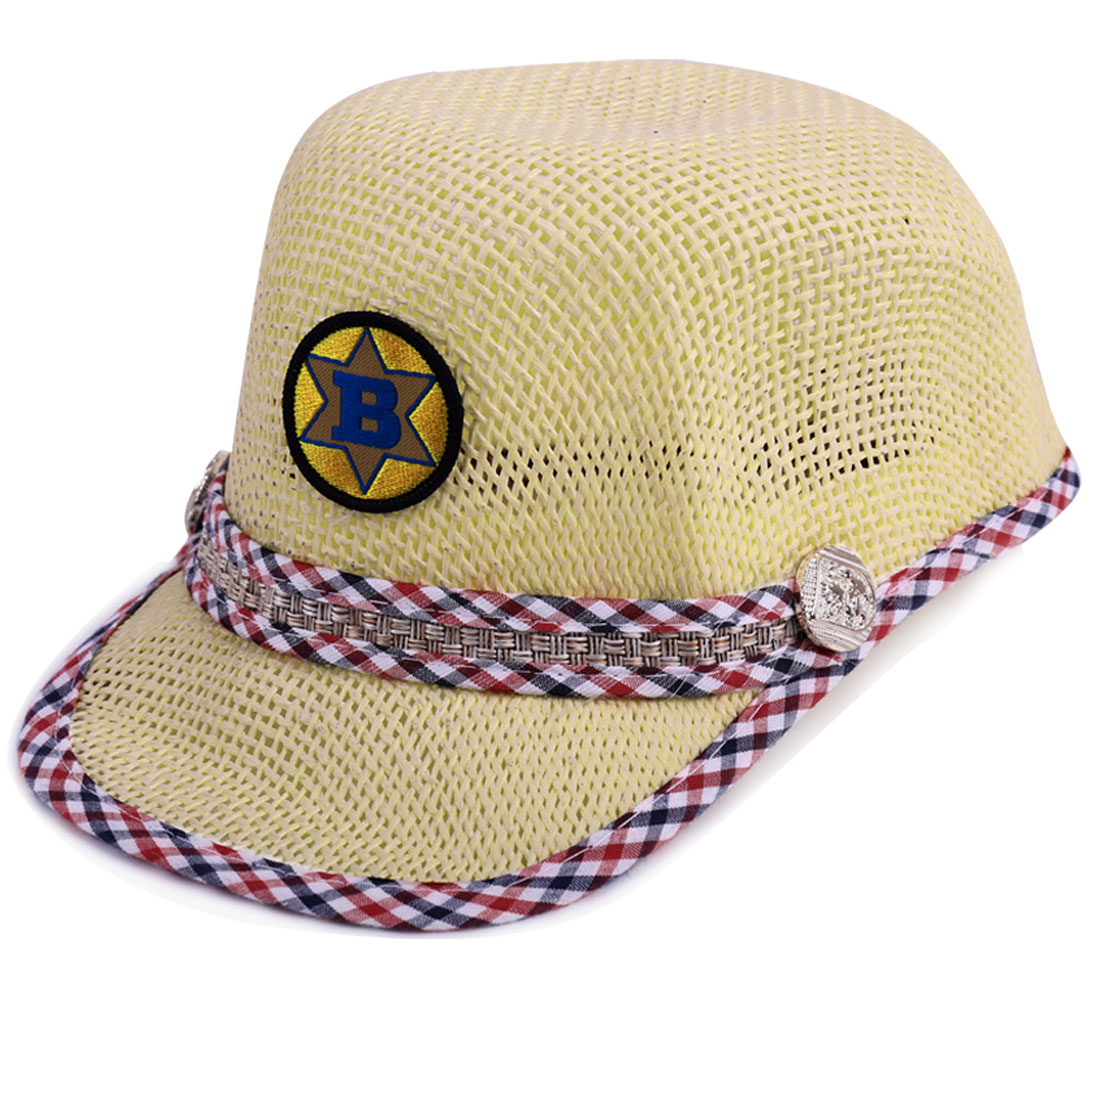 Children Pliaids Detail Letter Embellished Woven Straw Cap Beige